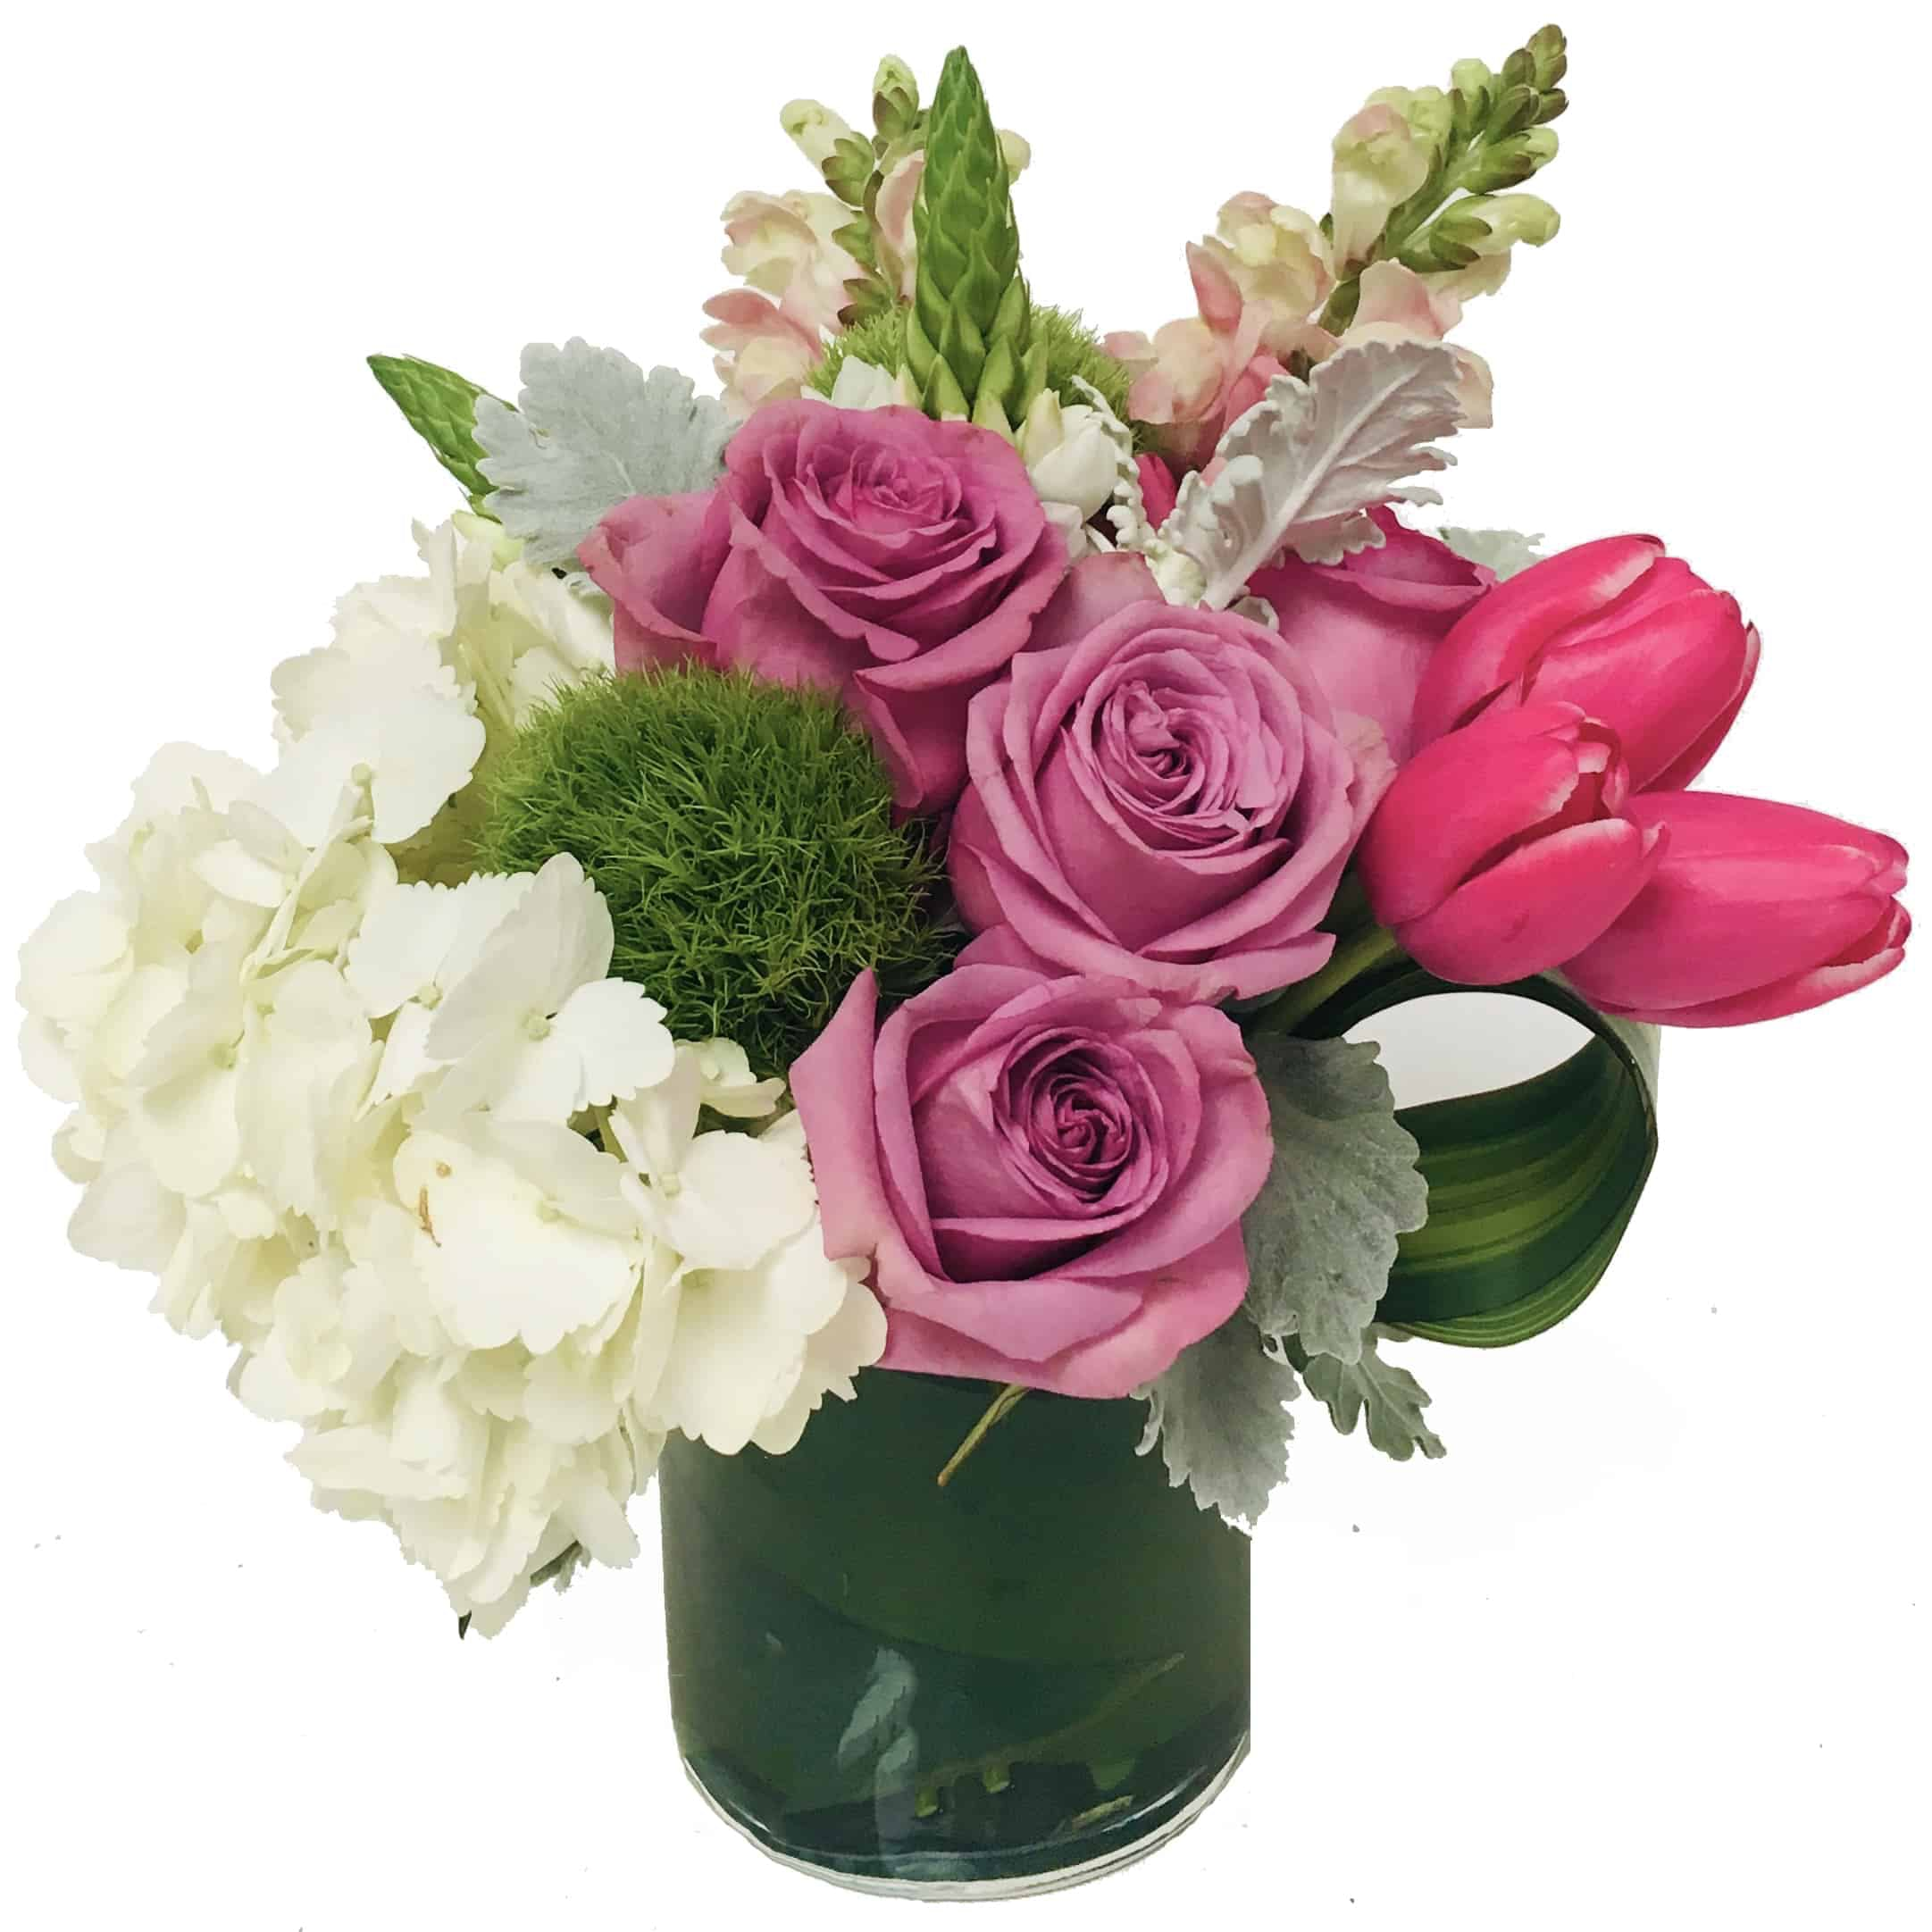 Flavius Flower Flower Arrangement | San Francisco Florist Since 1871 Free Bay Area and San Francisco Flower Delivery